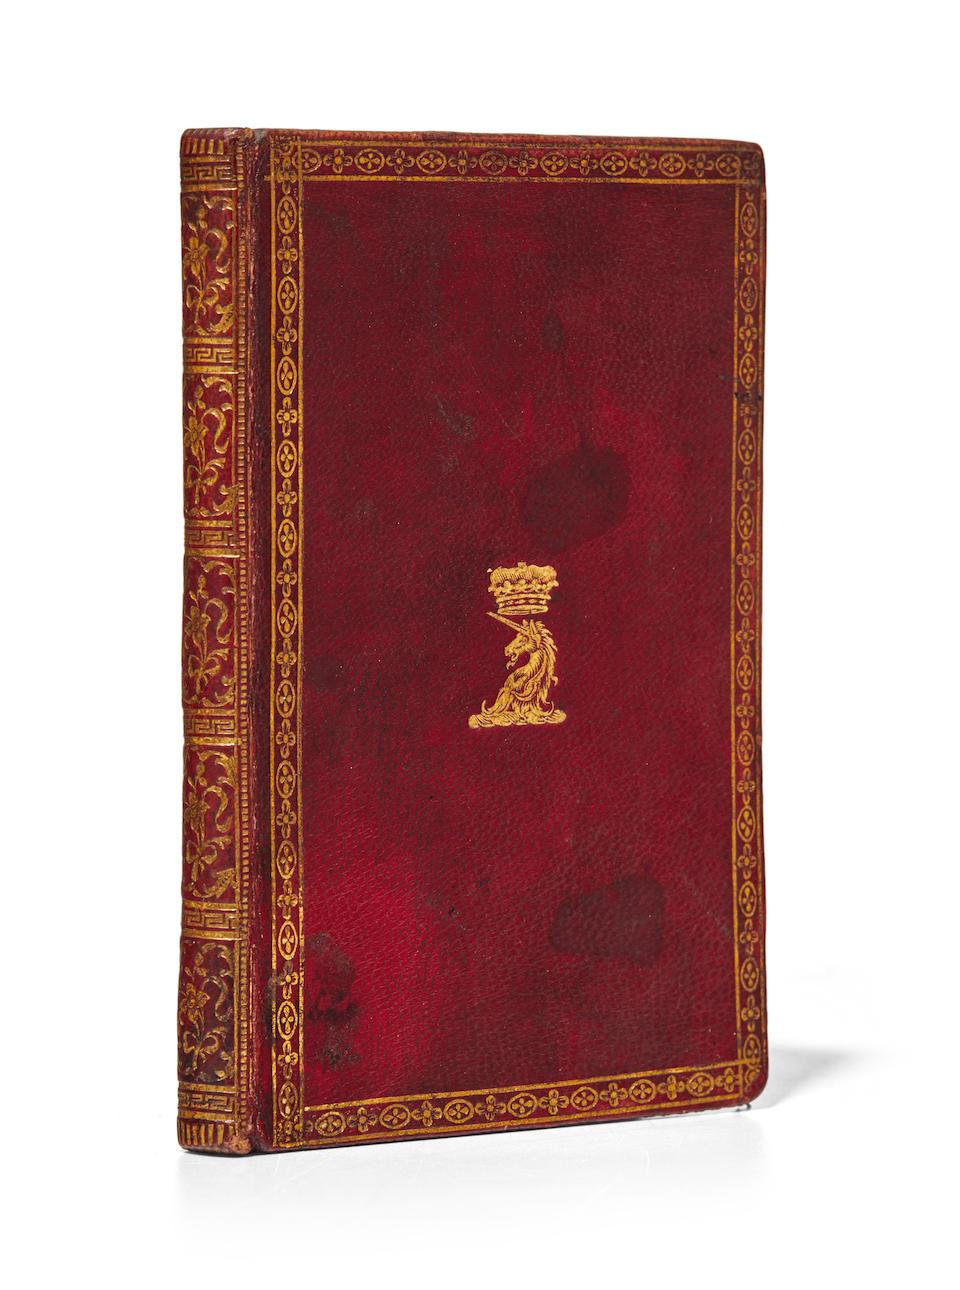 POSTEL, GUILLAUME. 1510-1581. Liber de Causis seu de Principiis & originibus Naturæ v-triusque.... Paris: S. Nivelle, 1552.